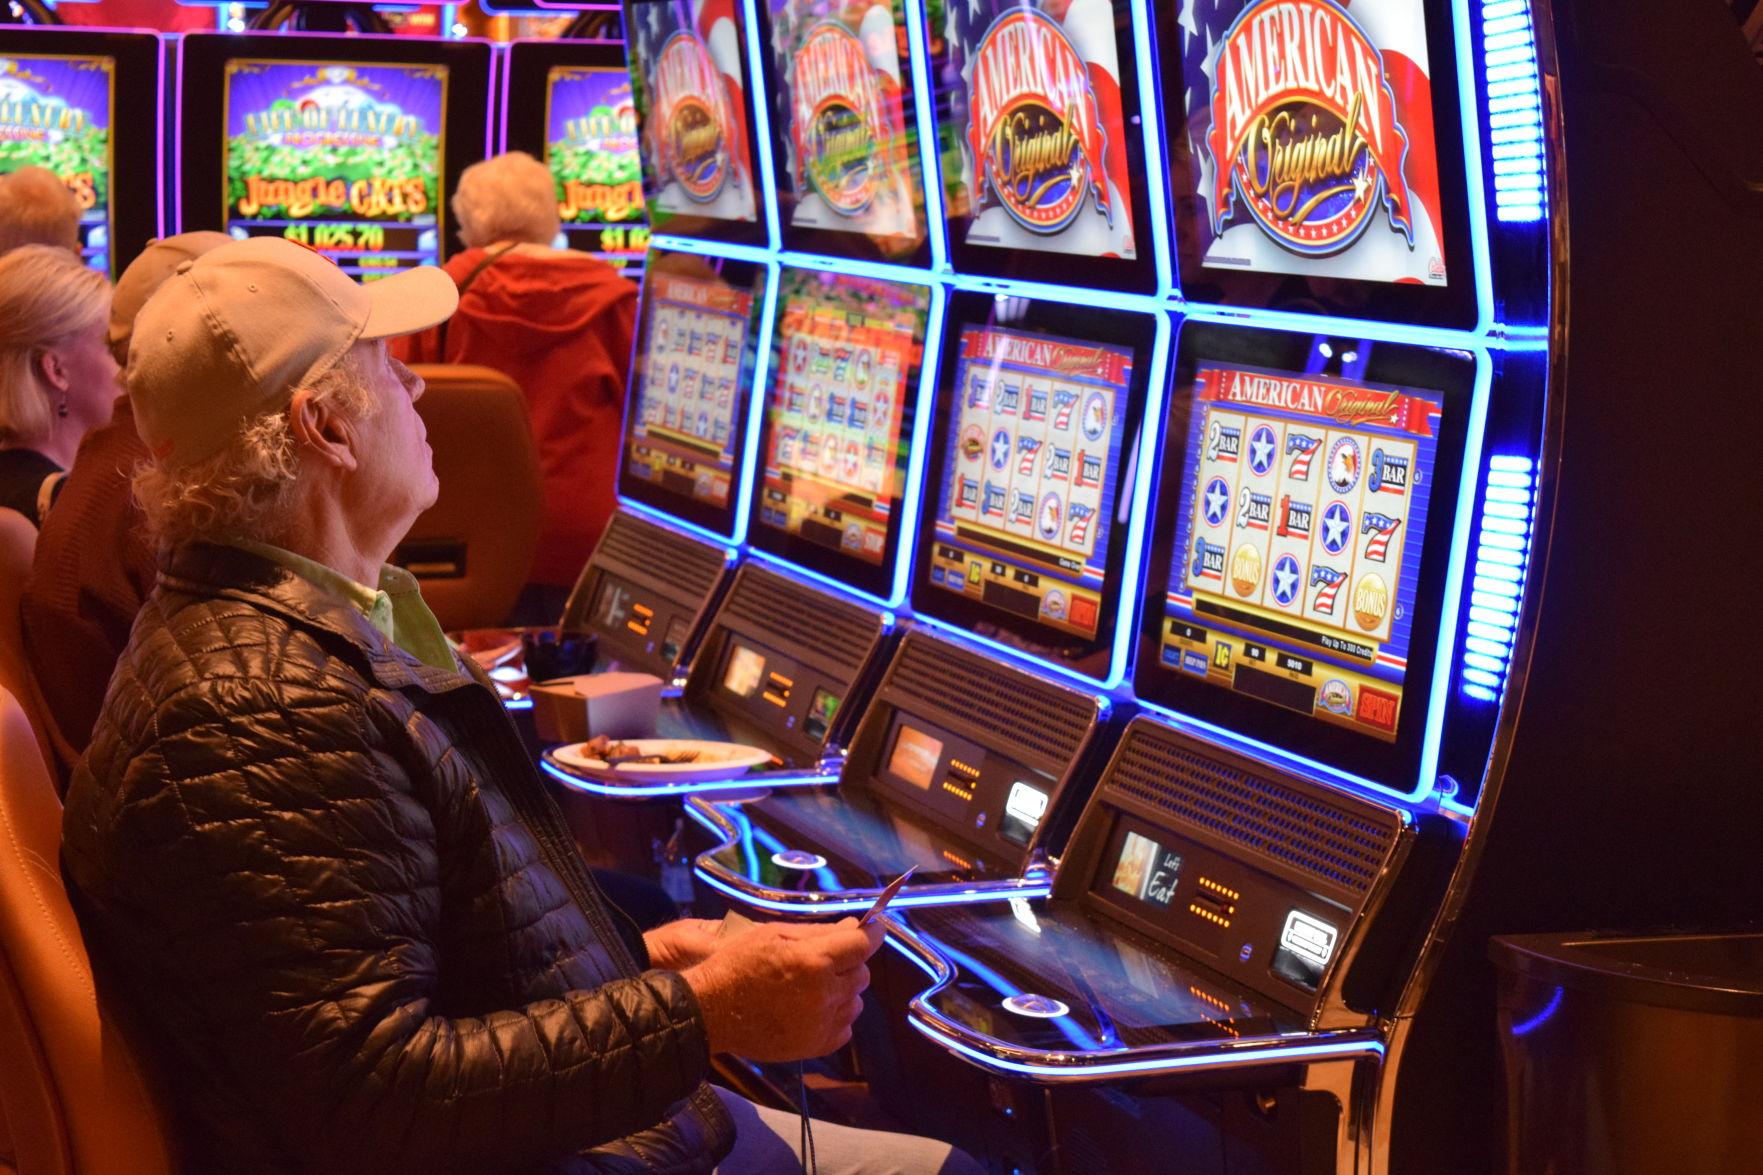 Casinos slot machines washington state allentown gambling addiction center